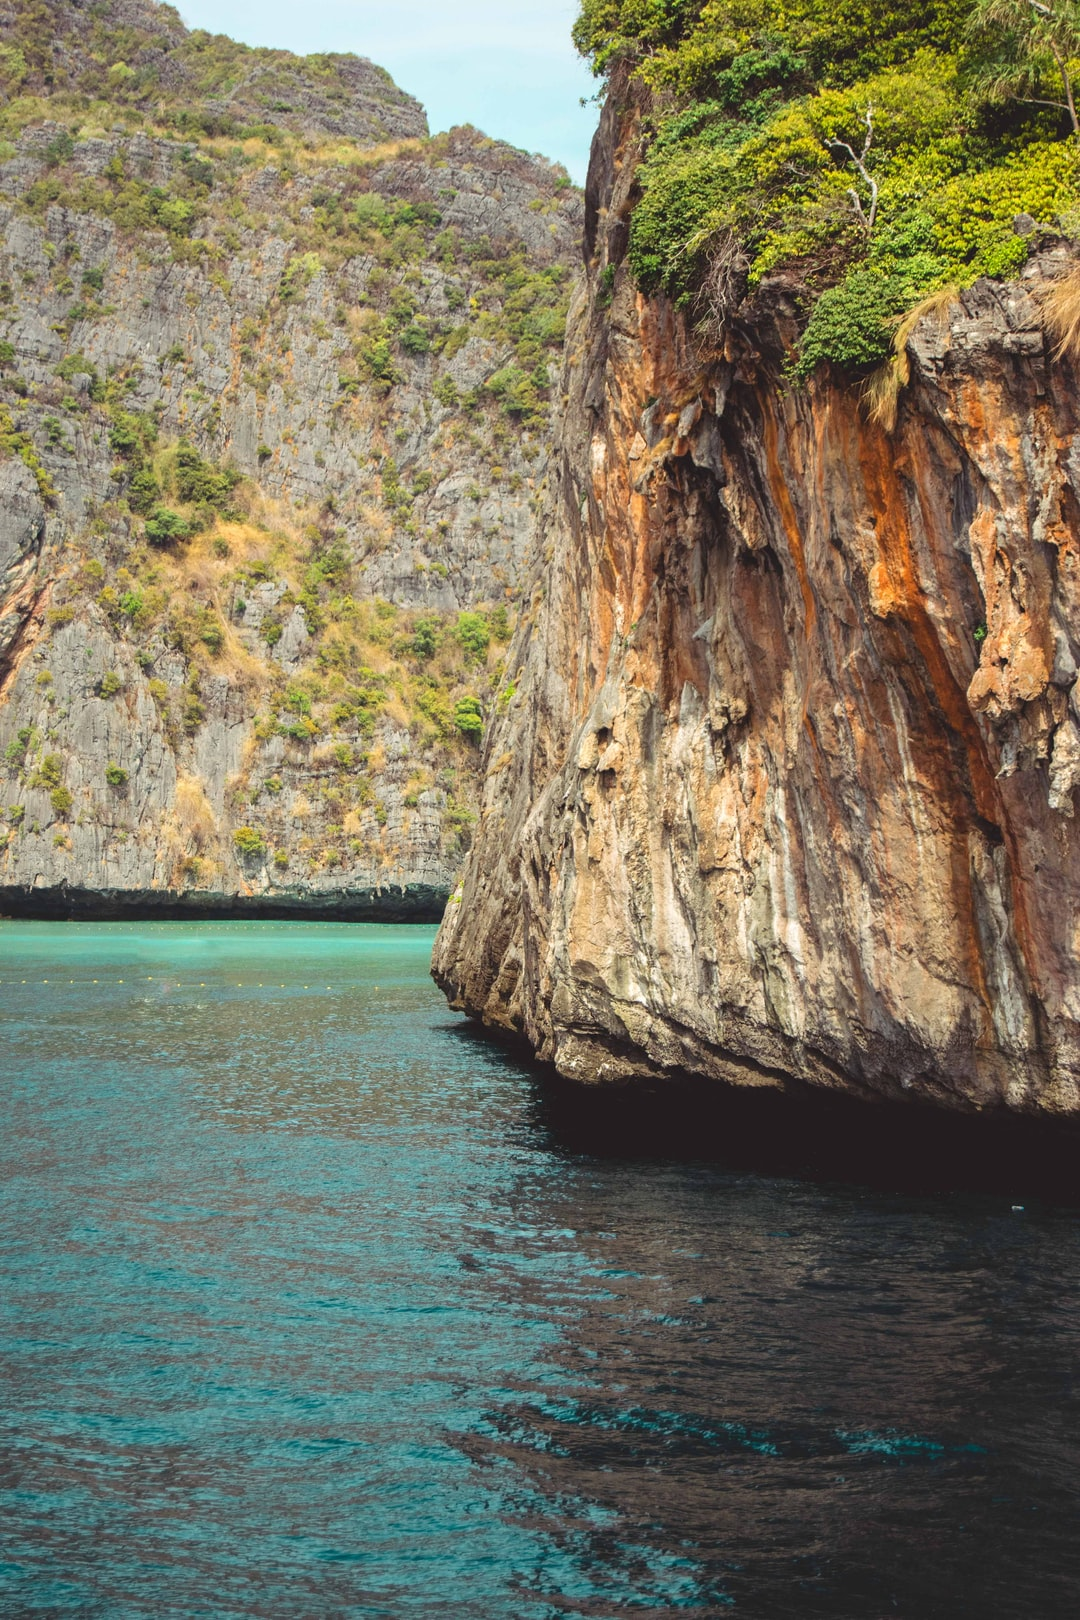 Cliff edge close to James Bond Island